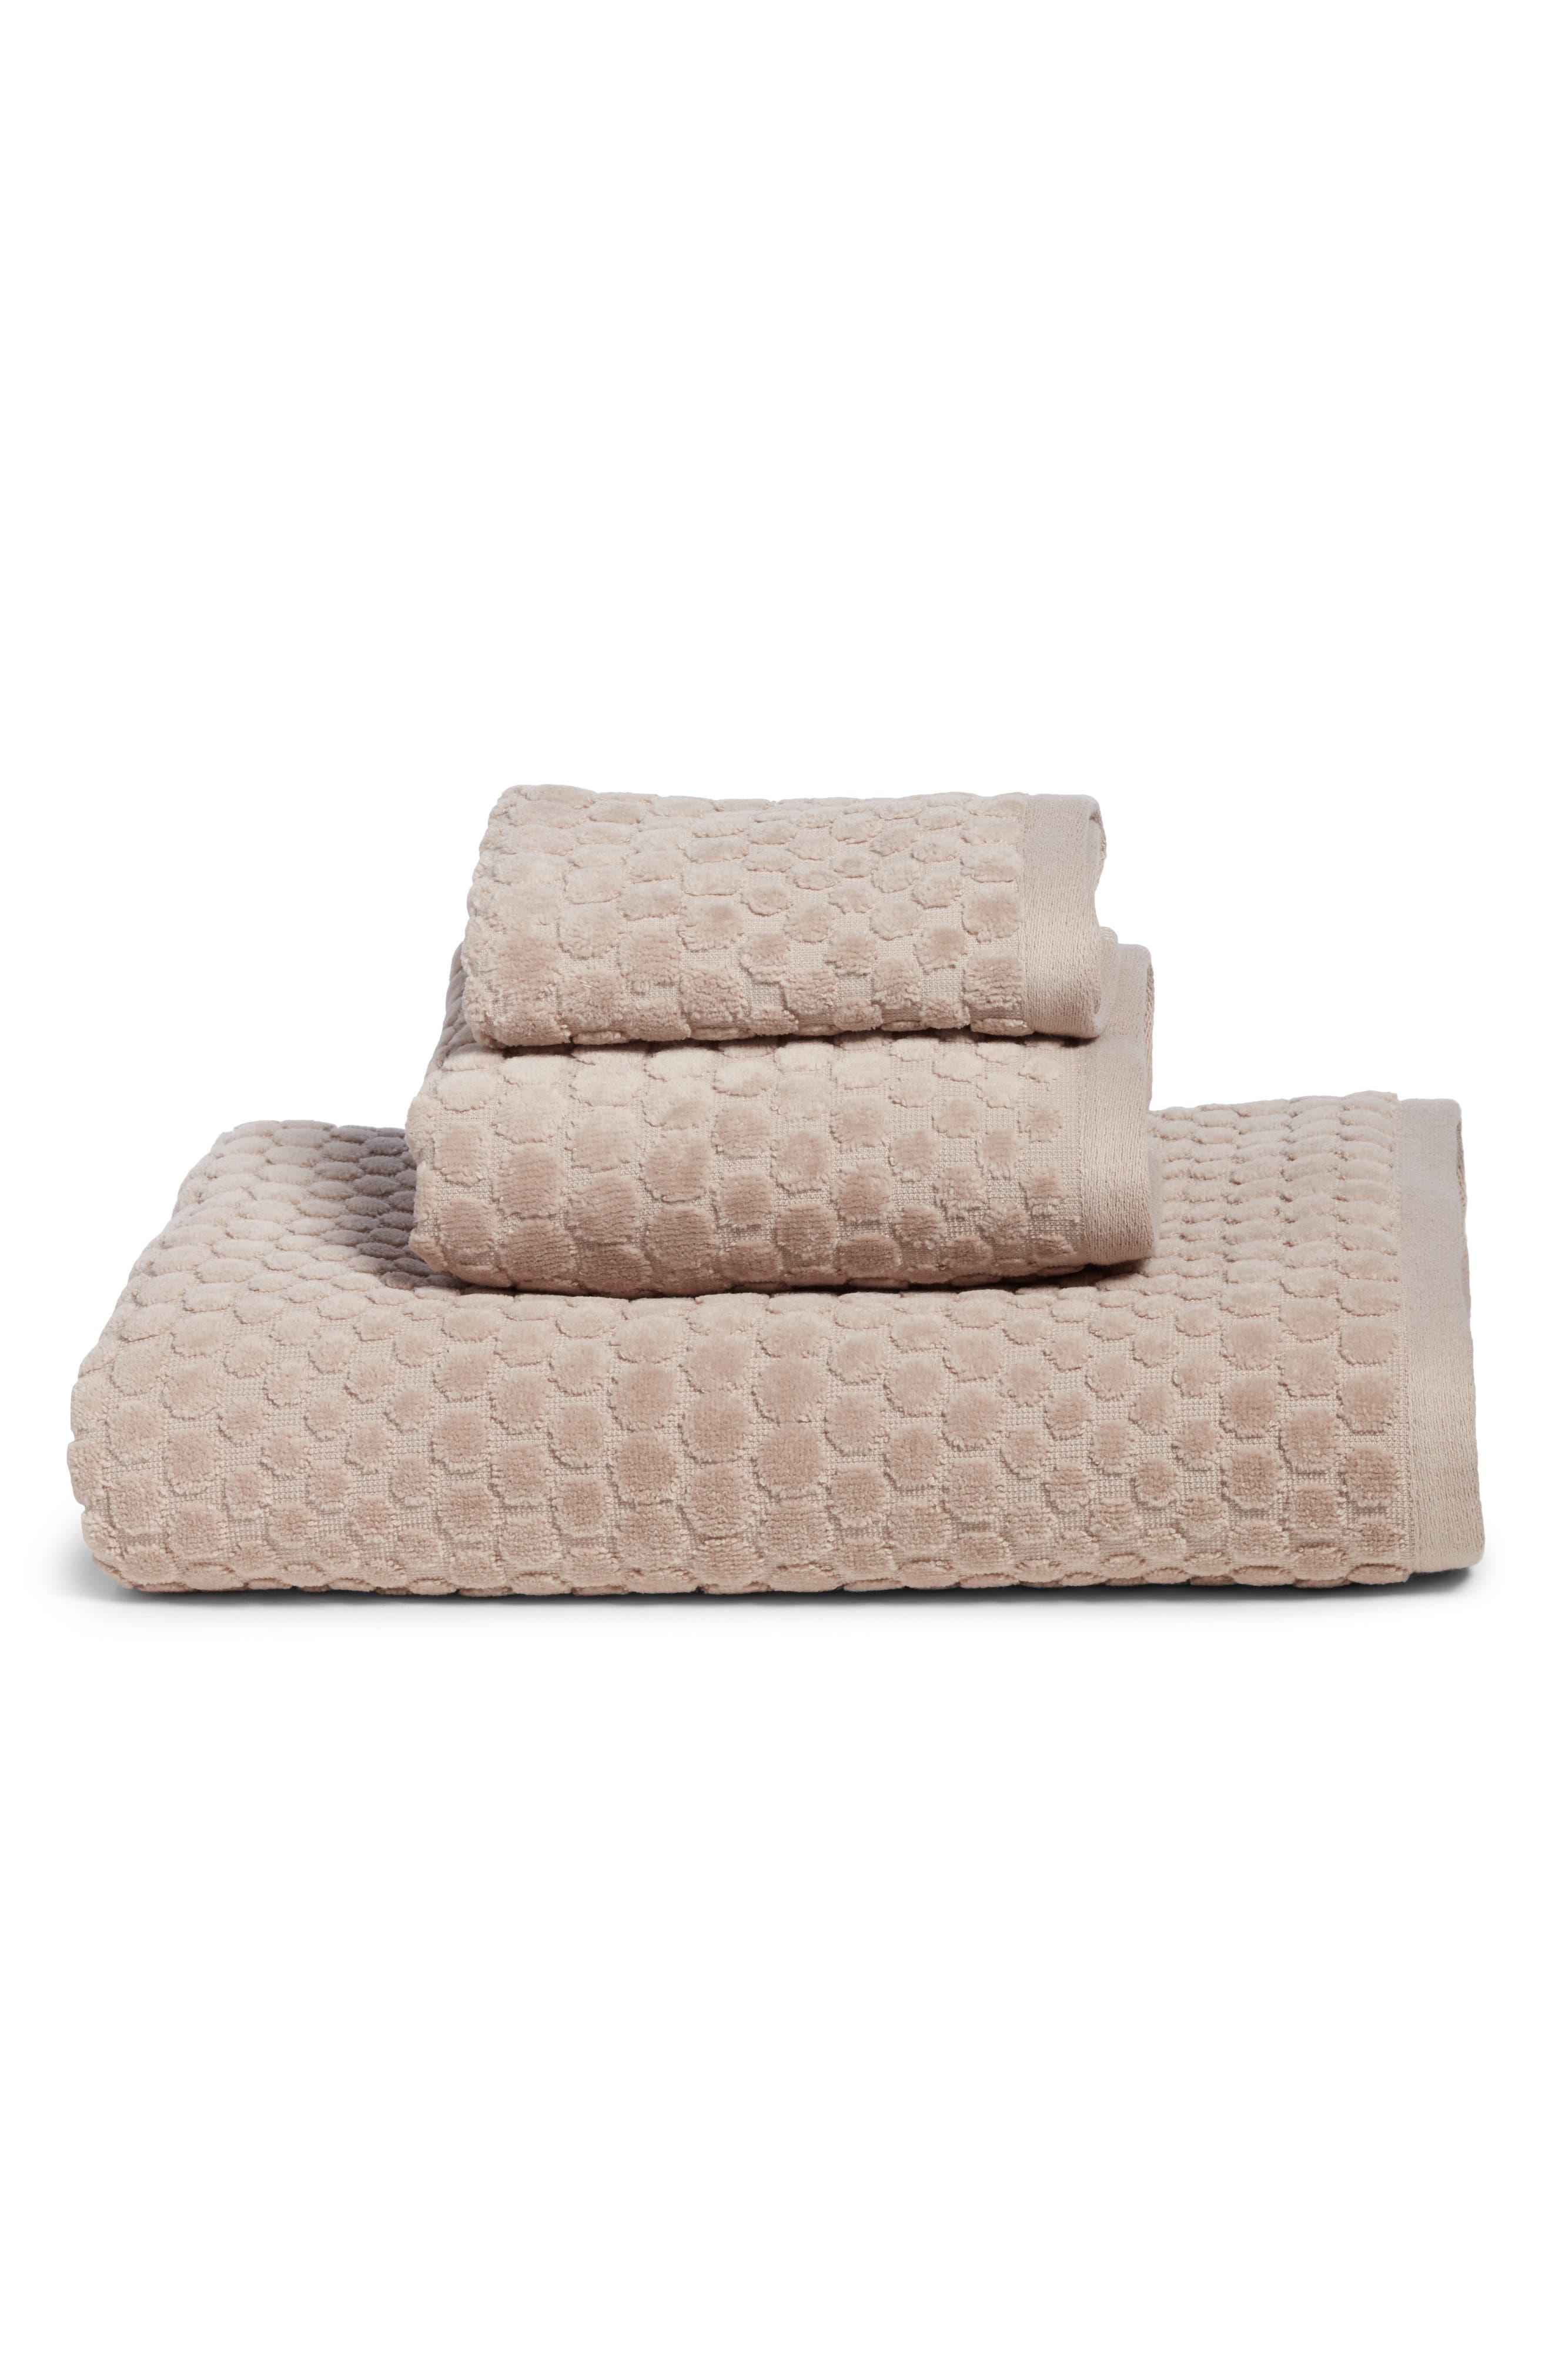 Lorenza Bath Towel,                             Alternate thumbnail 3, color,                             Grey Sphere